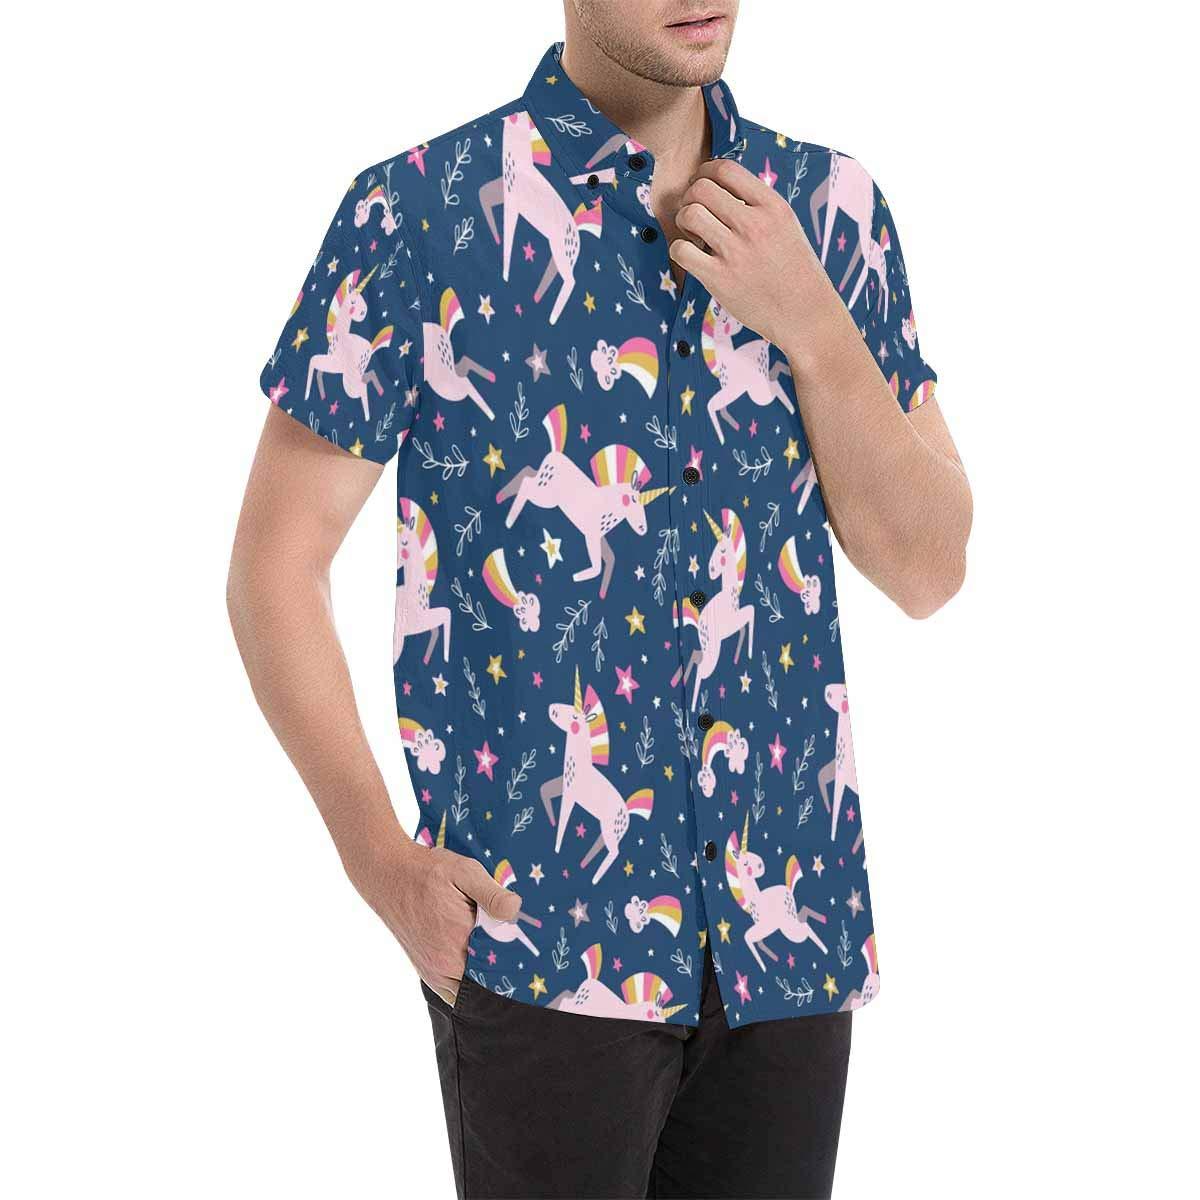 InterestPrint Mens Botton Up Floral Cute Unicorns Stars Short Sleeve Shirts